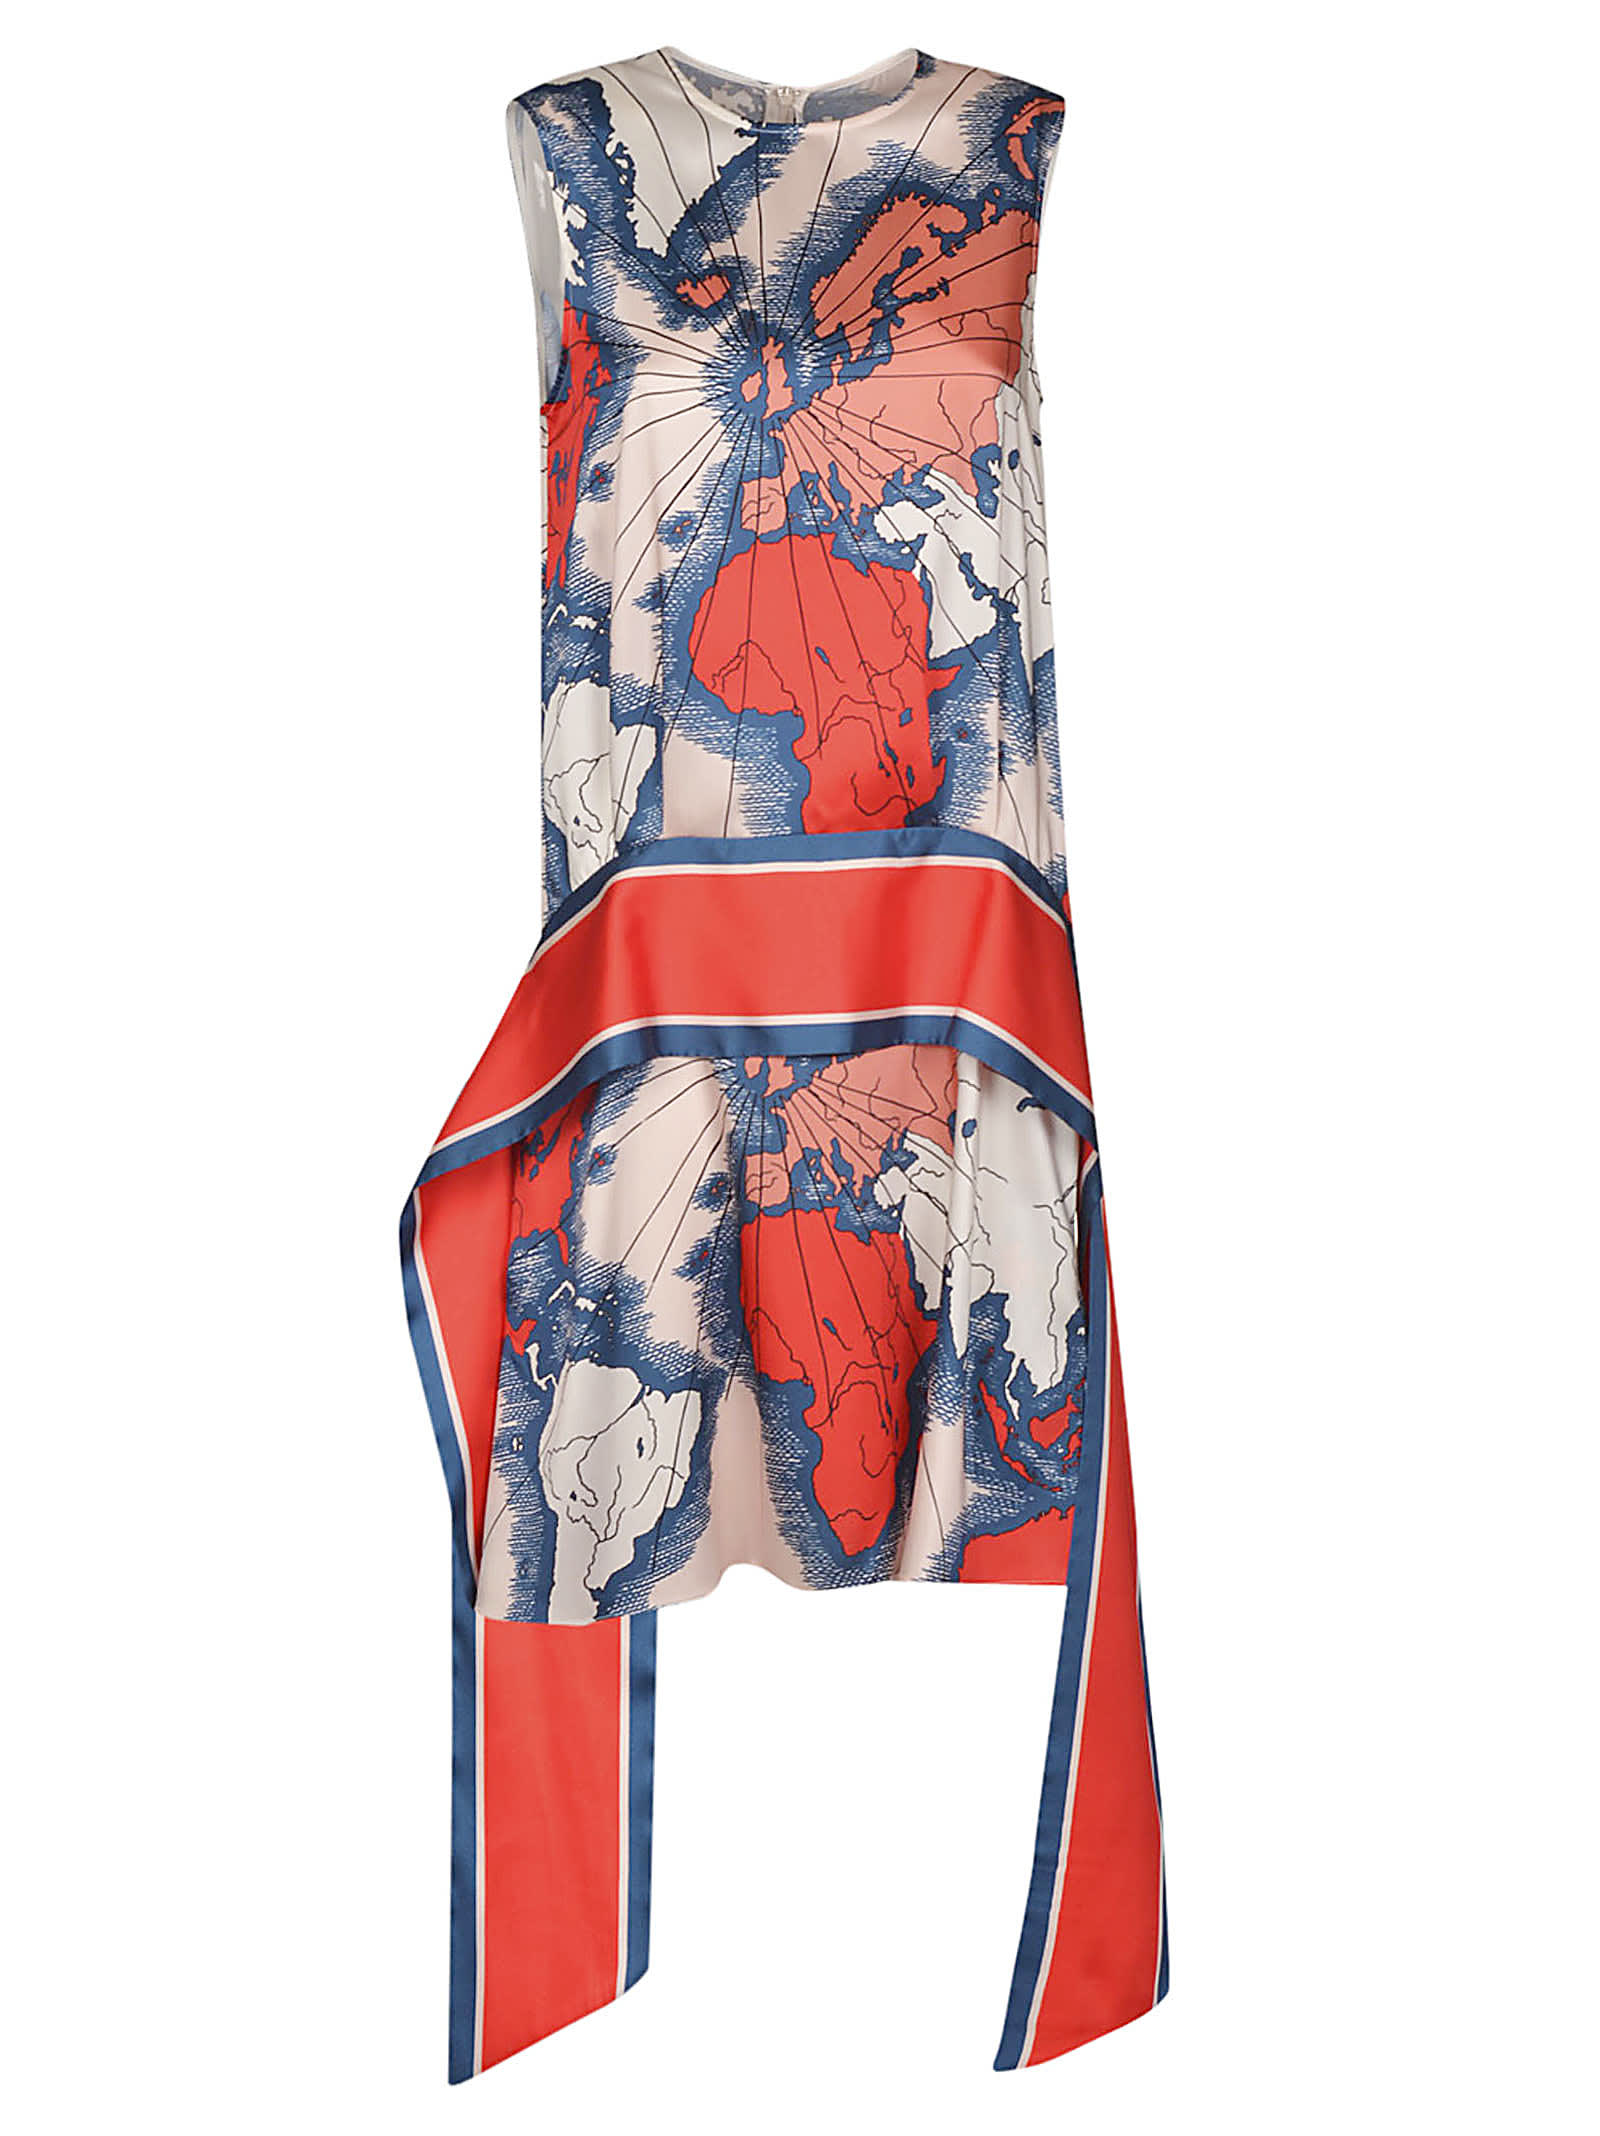 Victoria Beckham Printed Heavy Poly Twill Map Print Dress